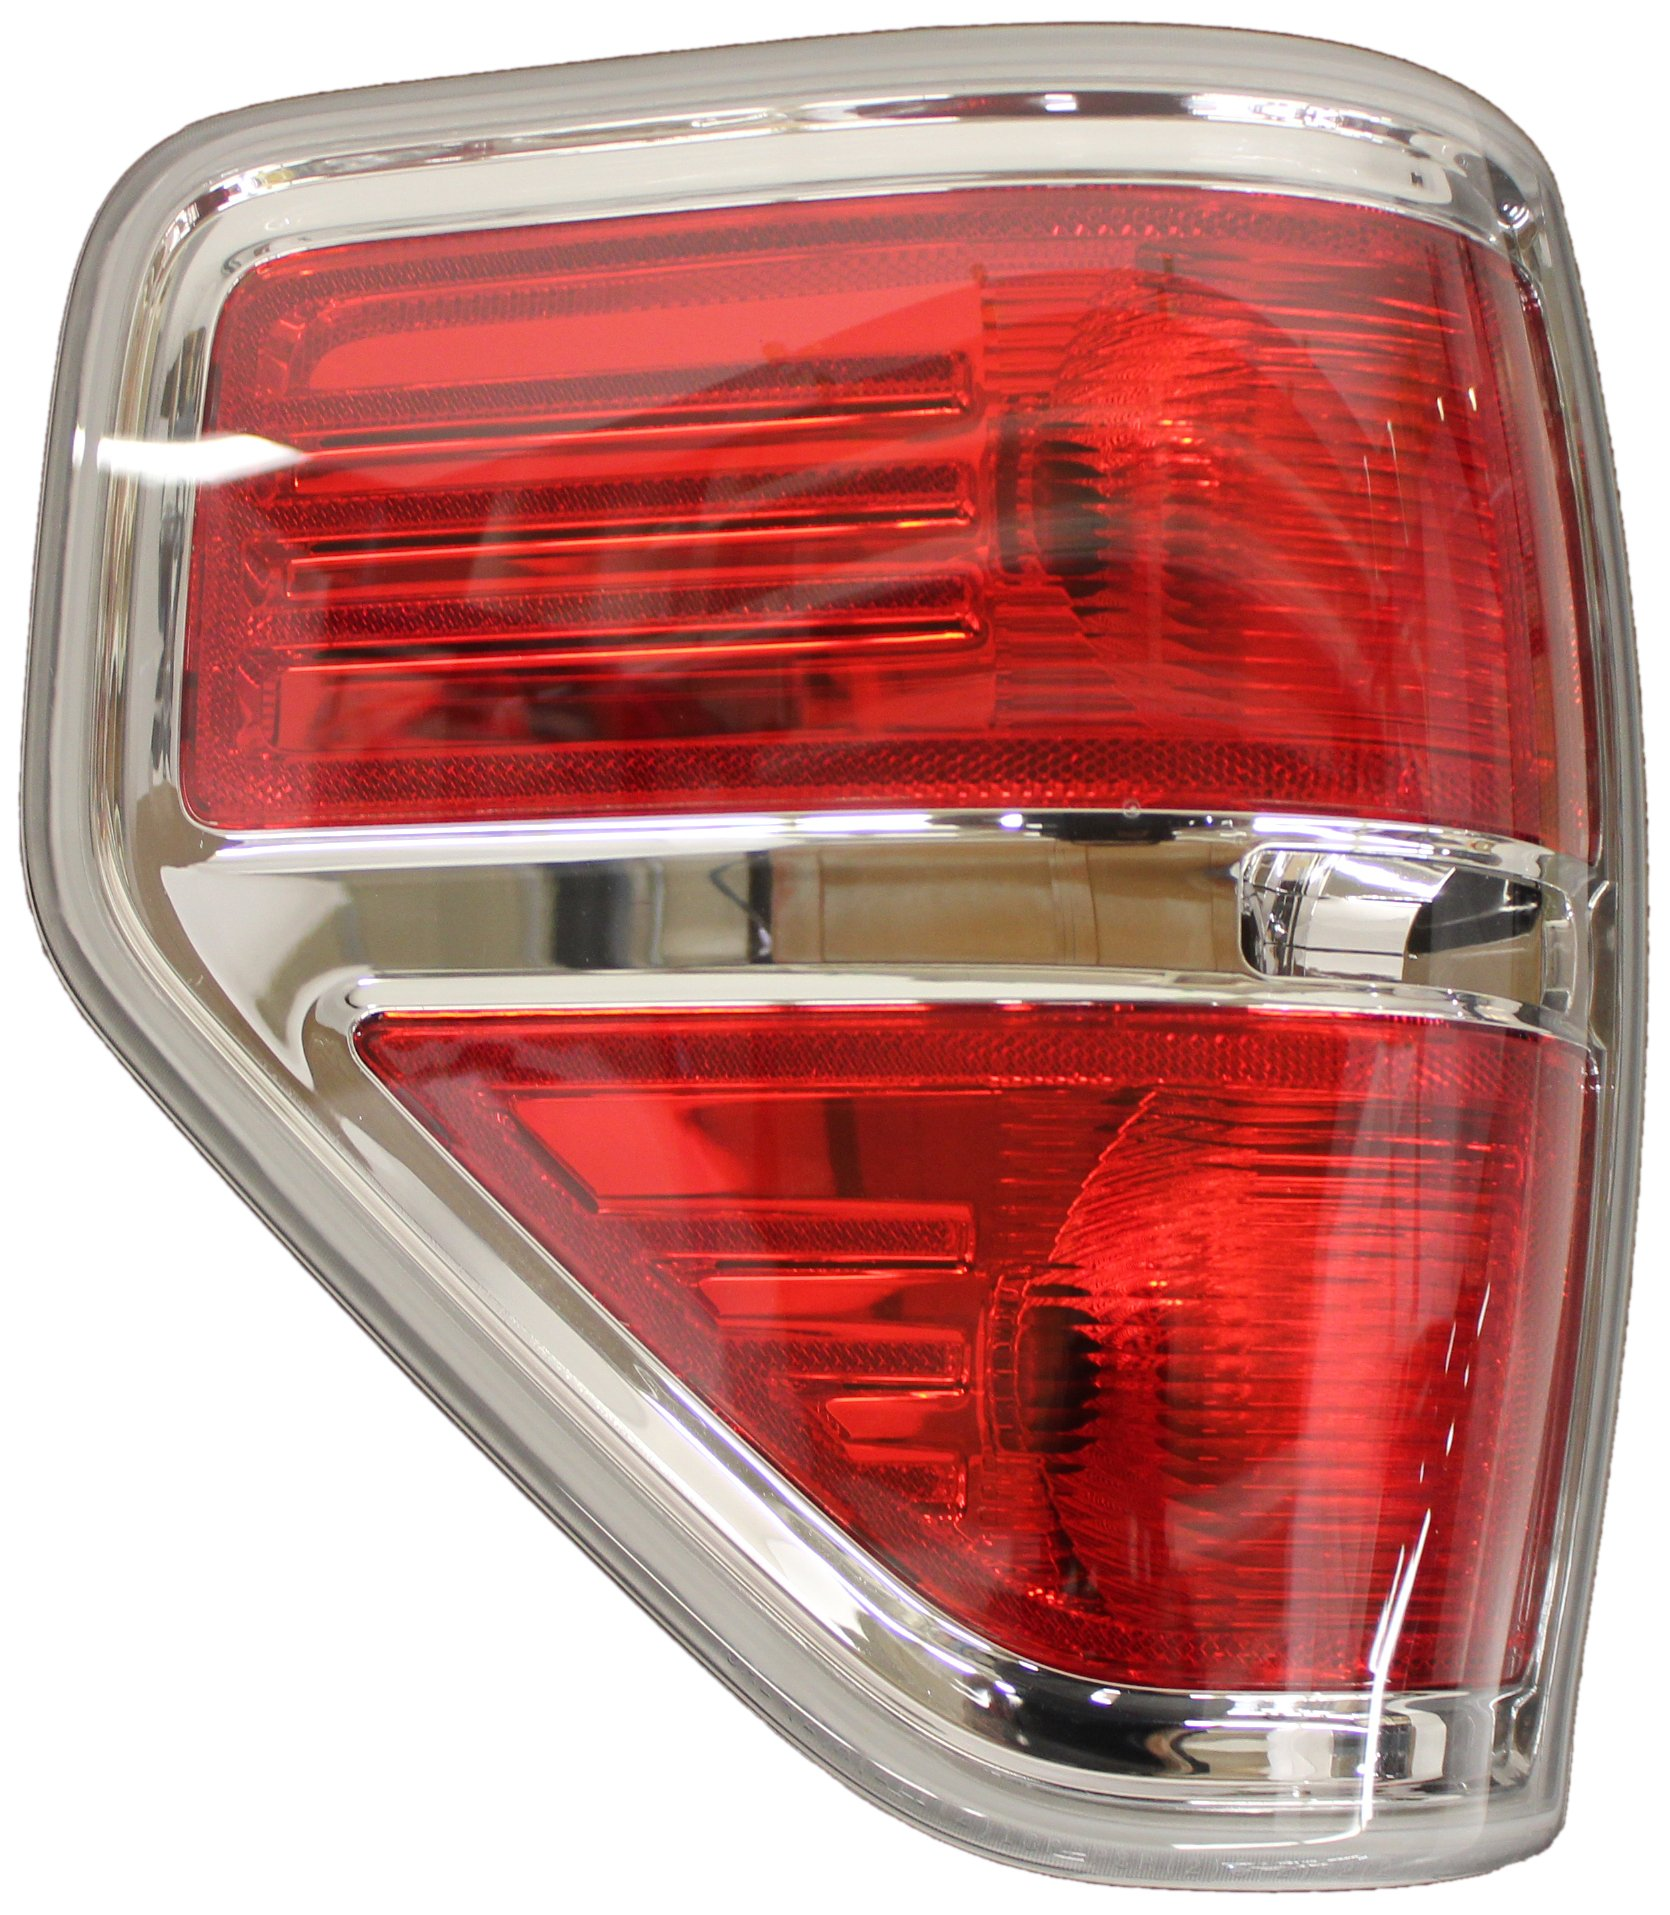 Genuine Ford BL3Z-13405-B Lamp Assembly